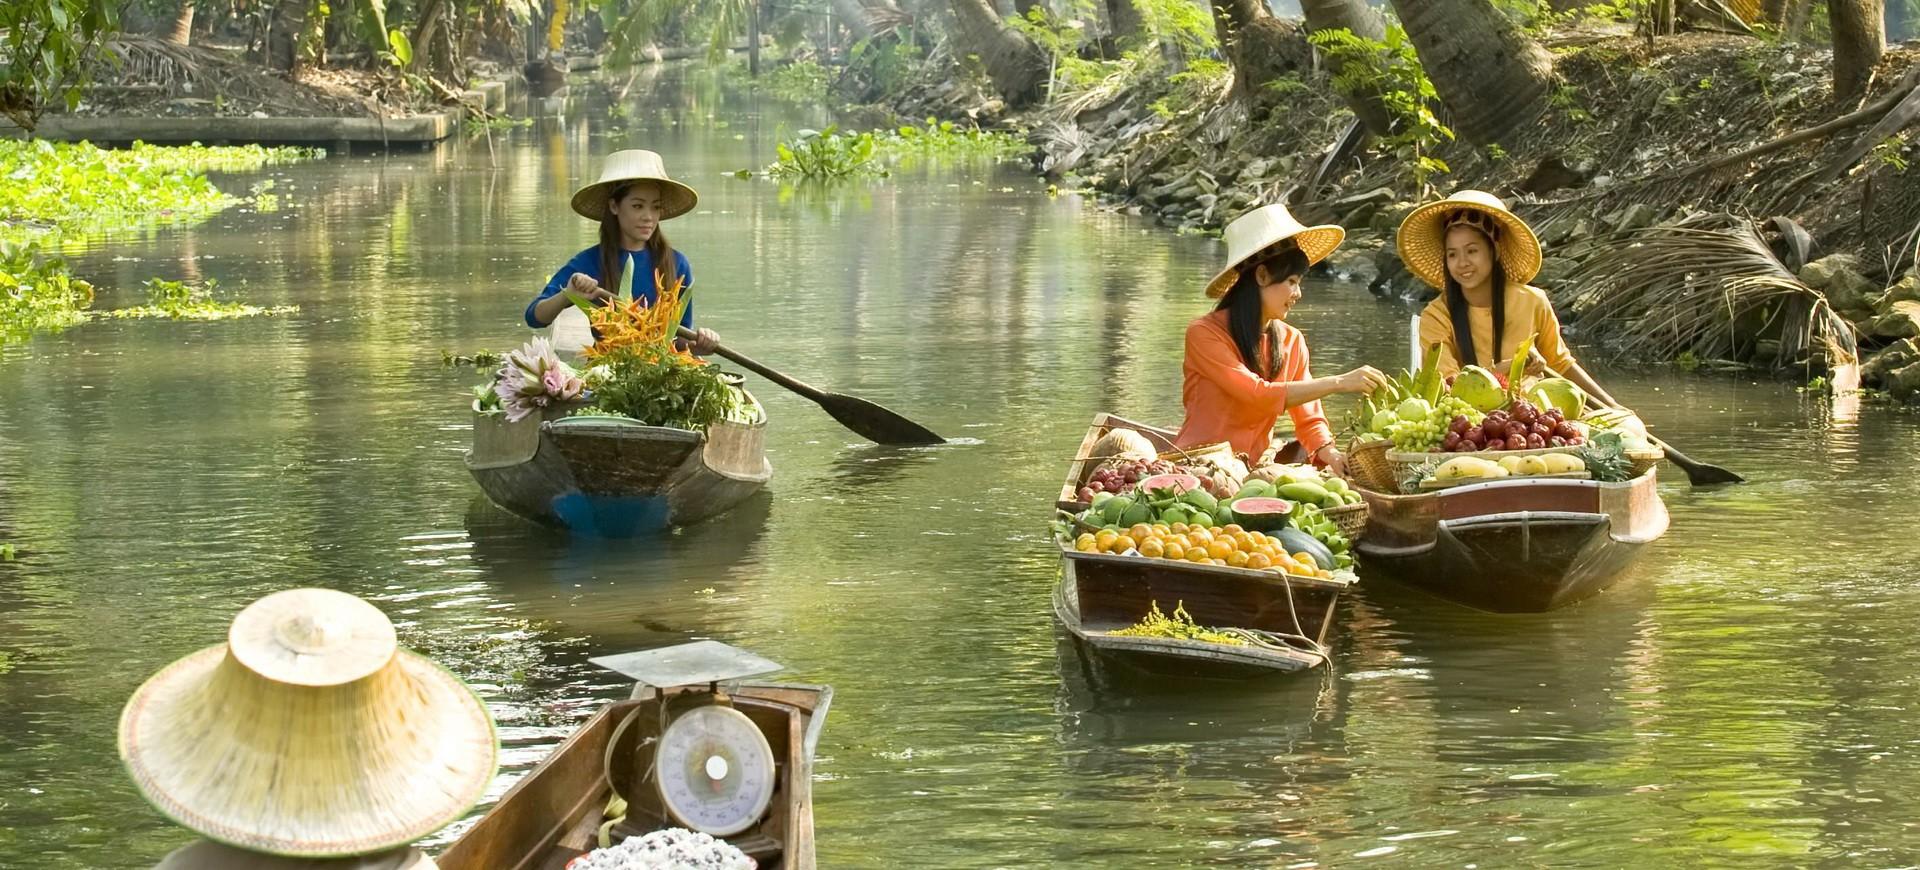 Thailande Samut Songkhram Marché Flottant